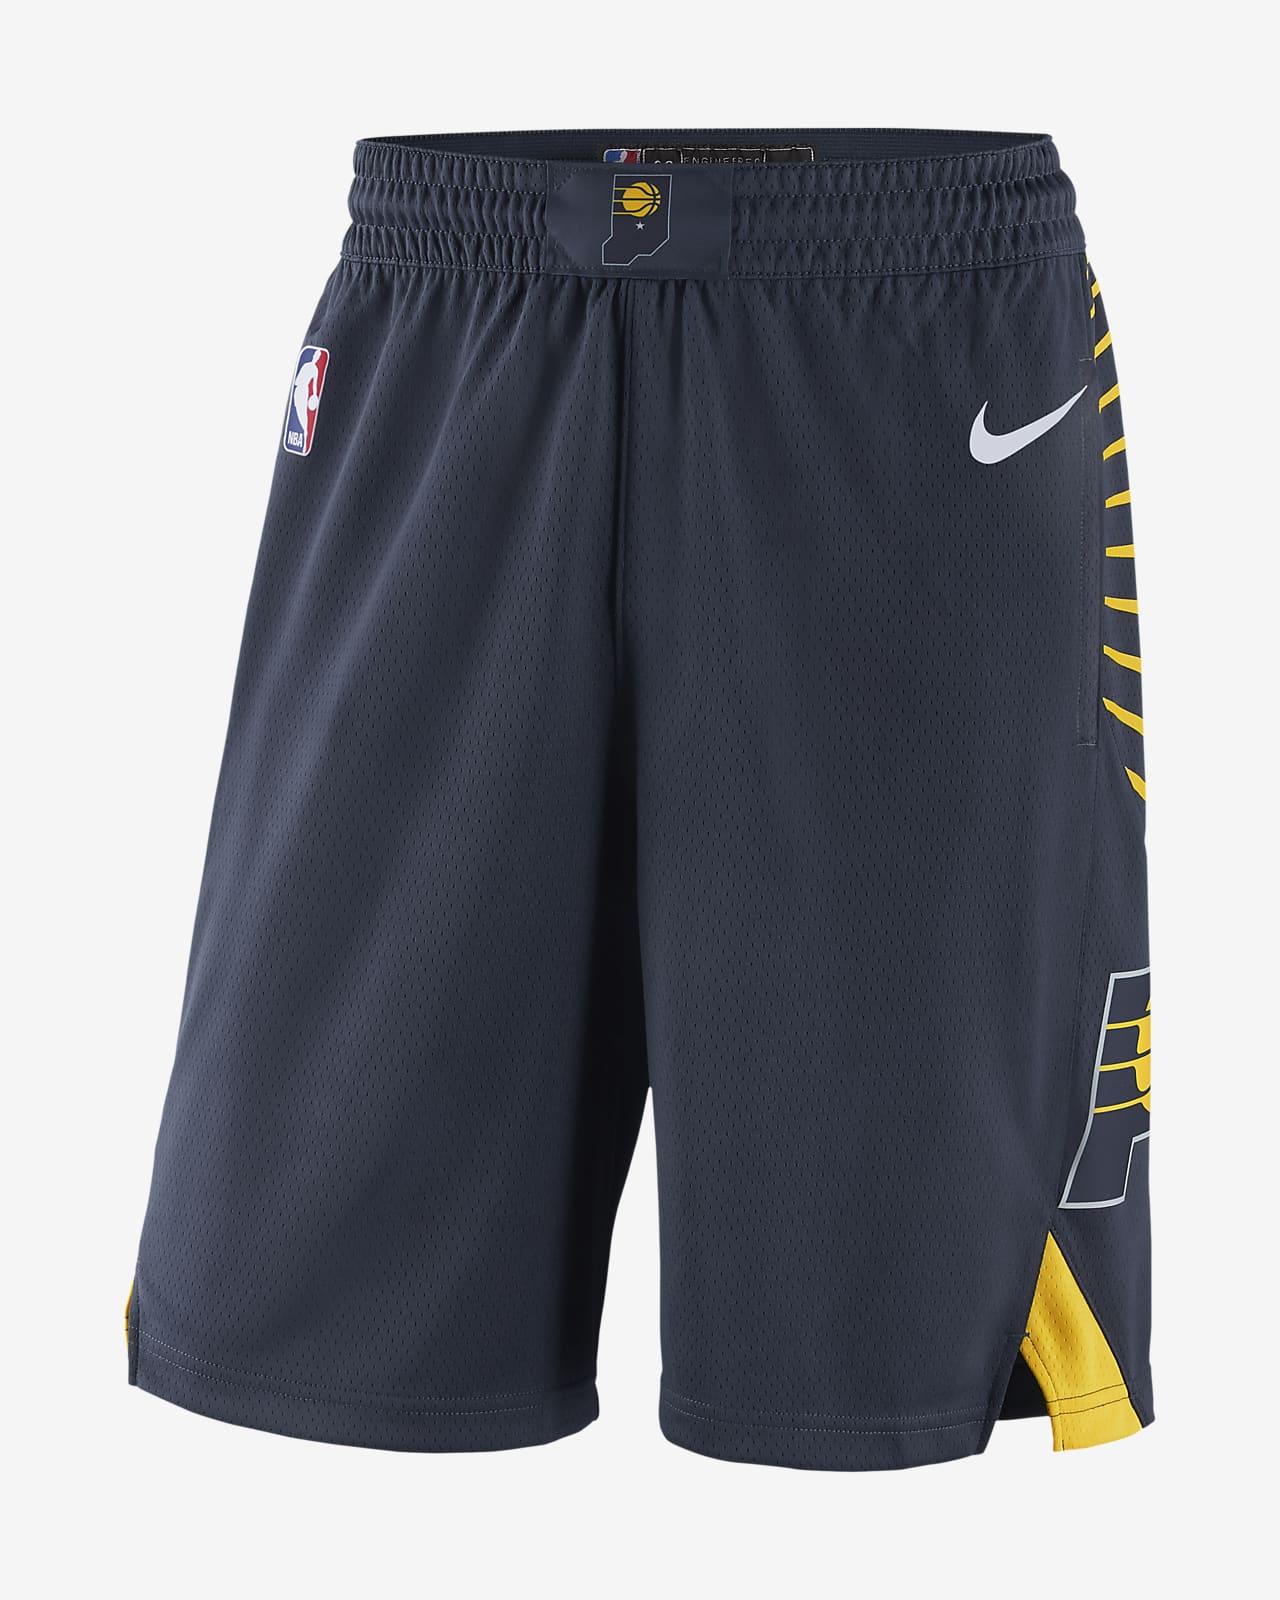 Indiana Pacers Icon Edition Men's Nike NBA Swingman Shorts